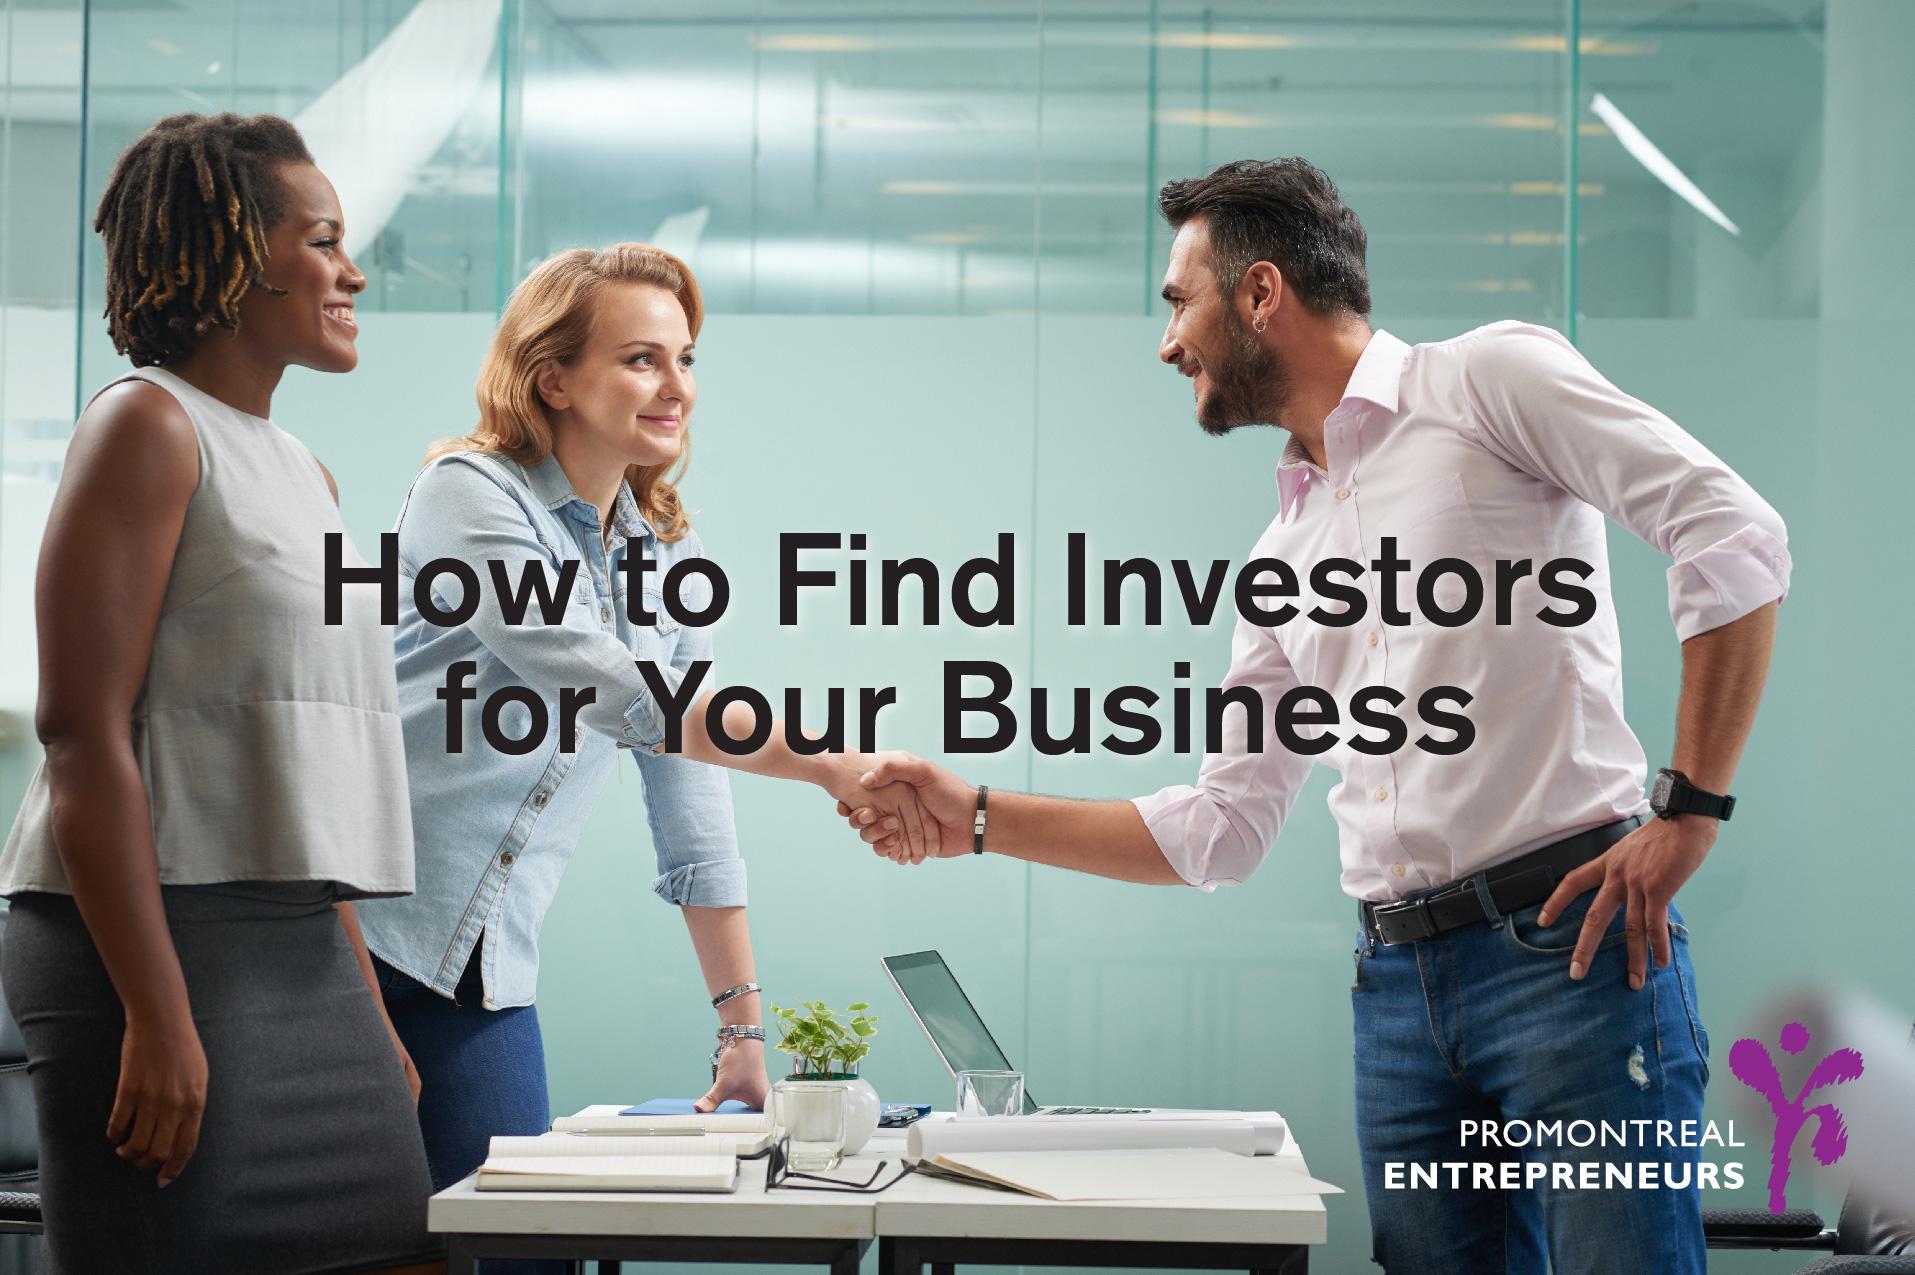 investors, business, start-ups